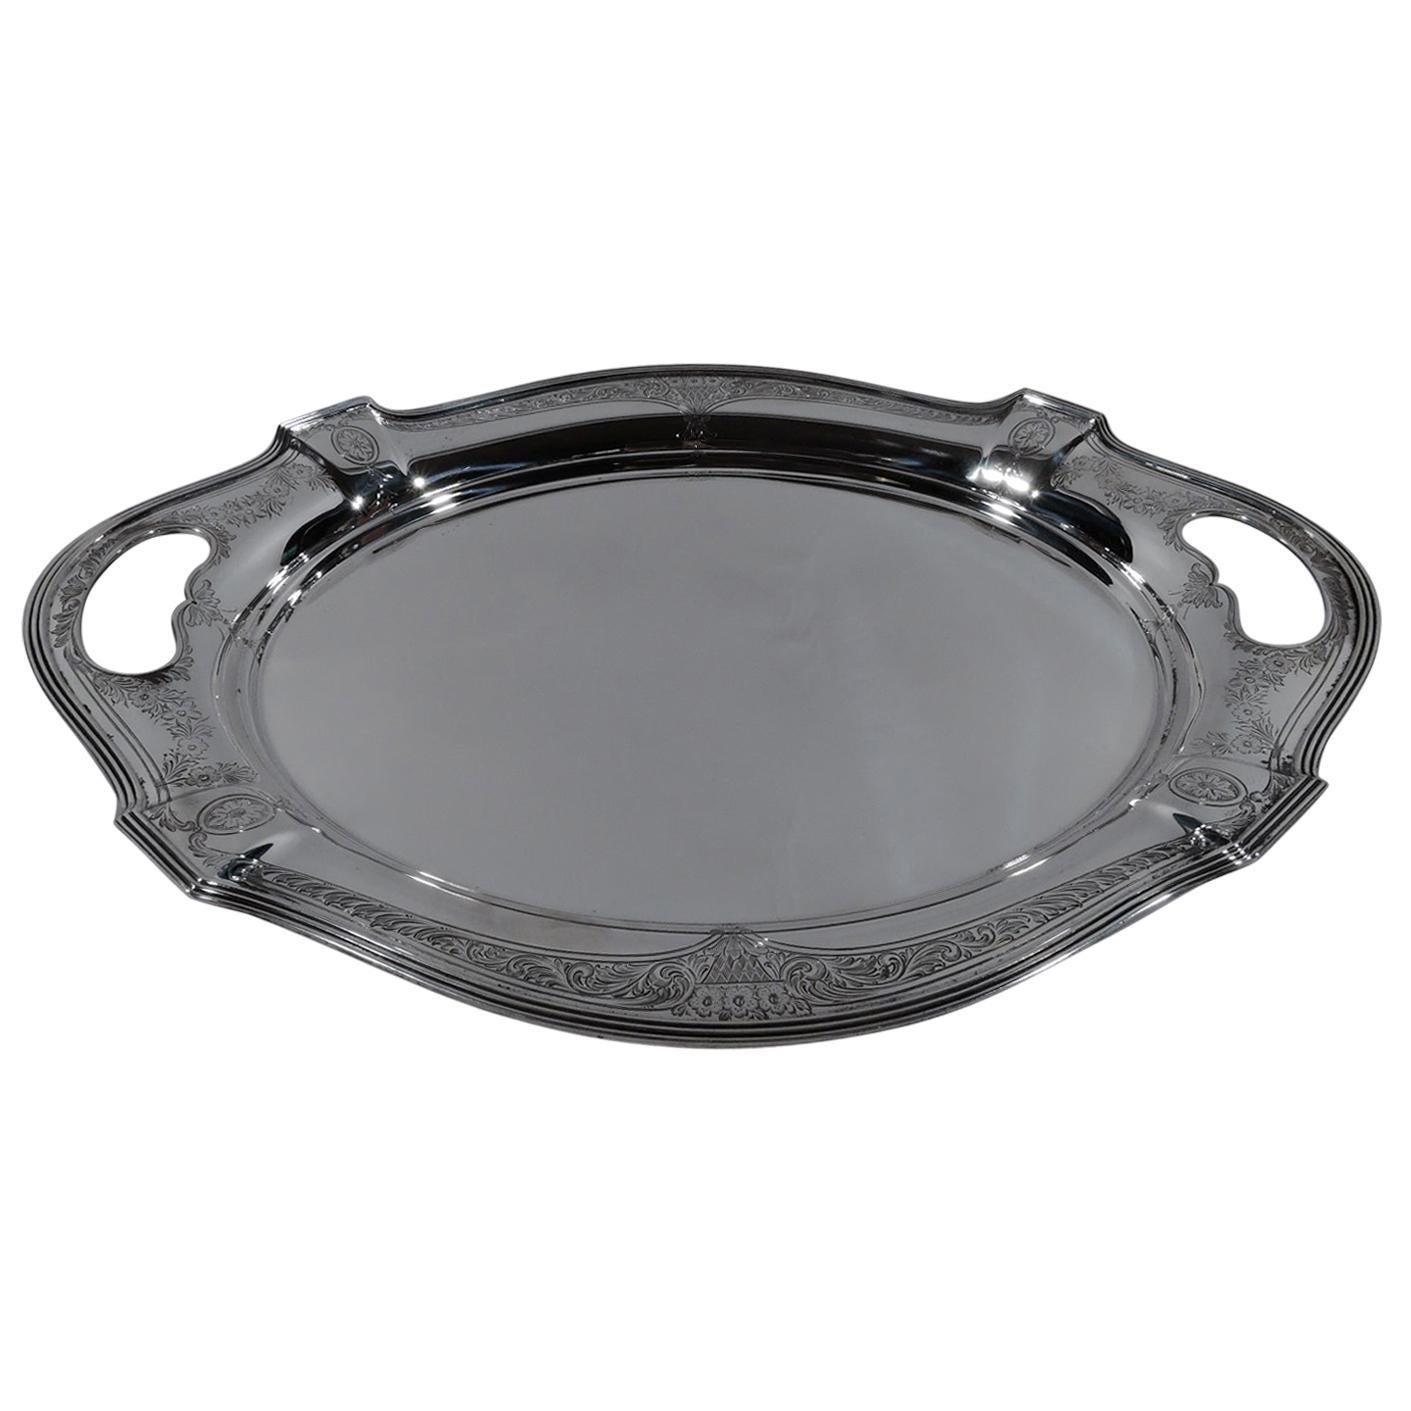 Antique Gorham Edwardian Regency Sterling Silver Platter Tray